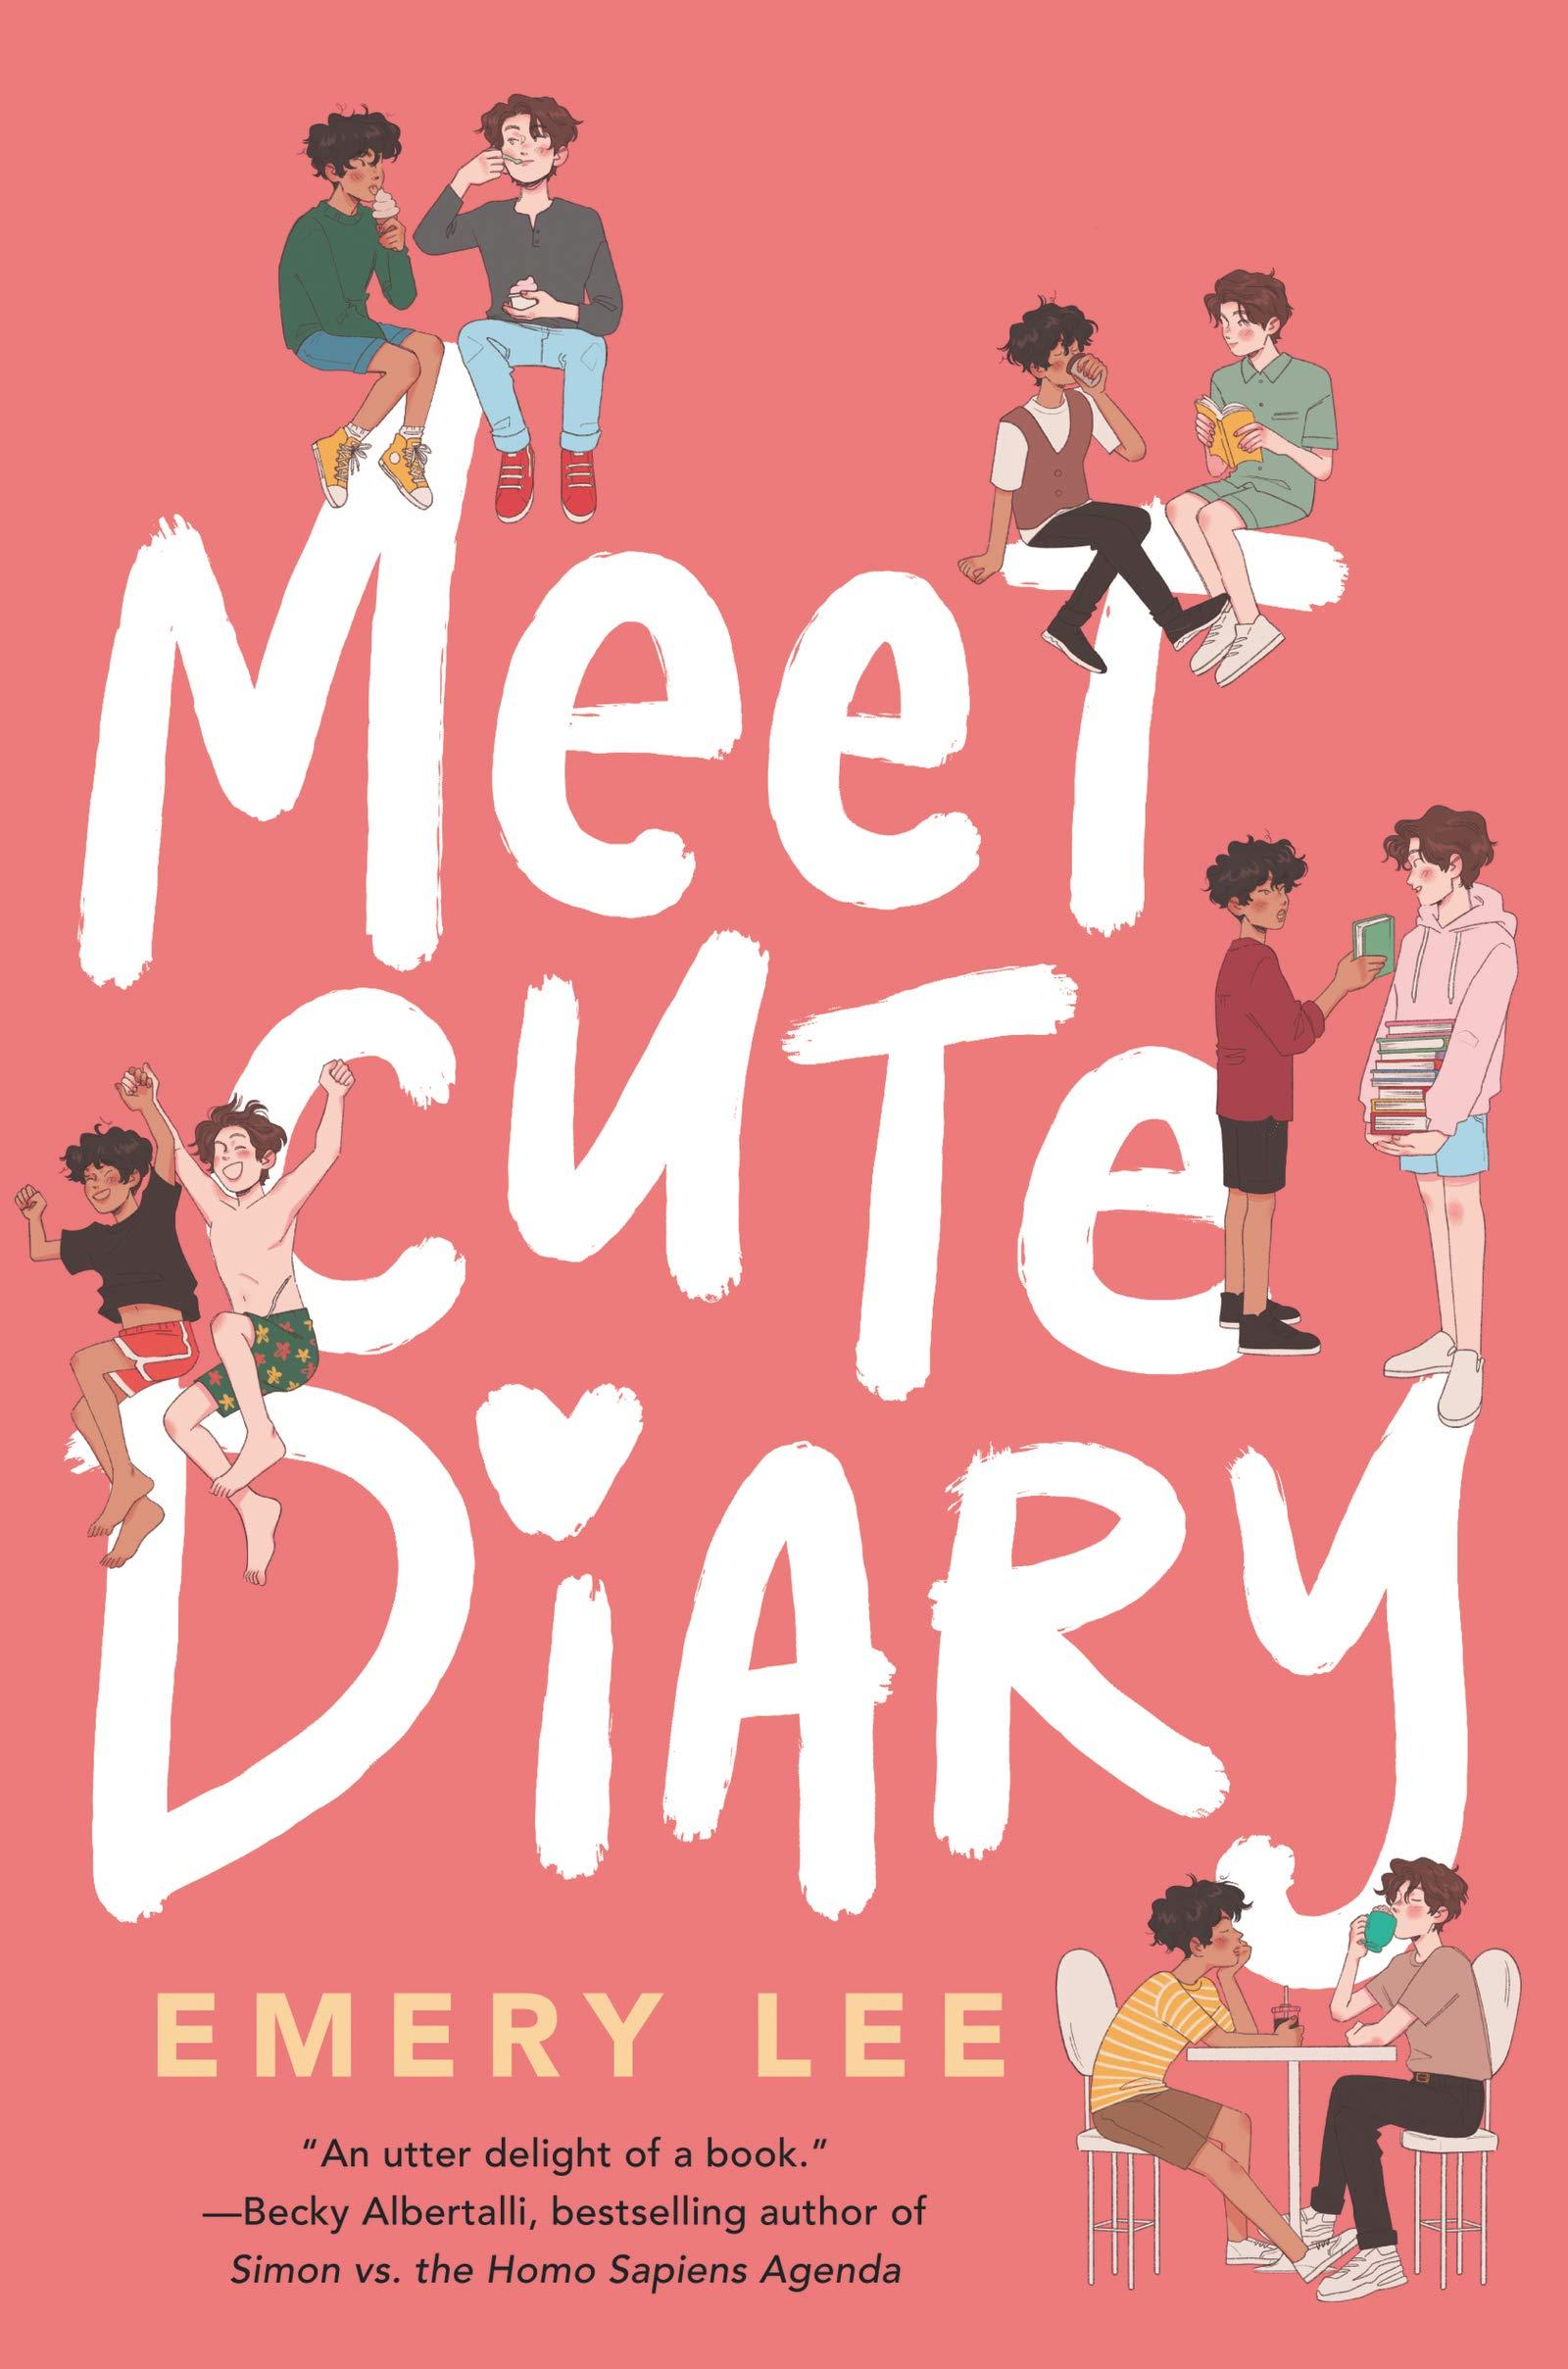 Meet Cute Diary : Lee, Emery: Amazon.co.uk: Books